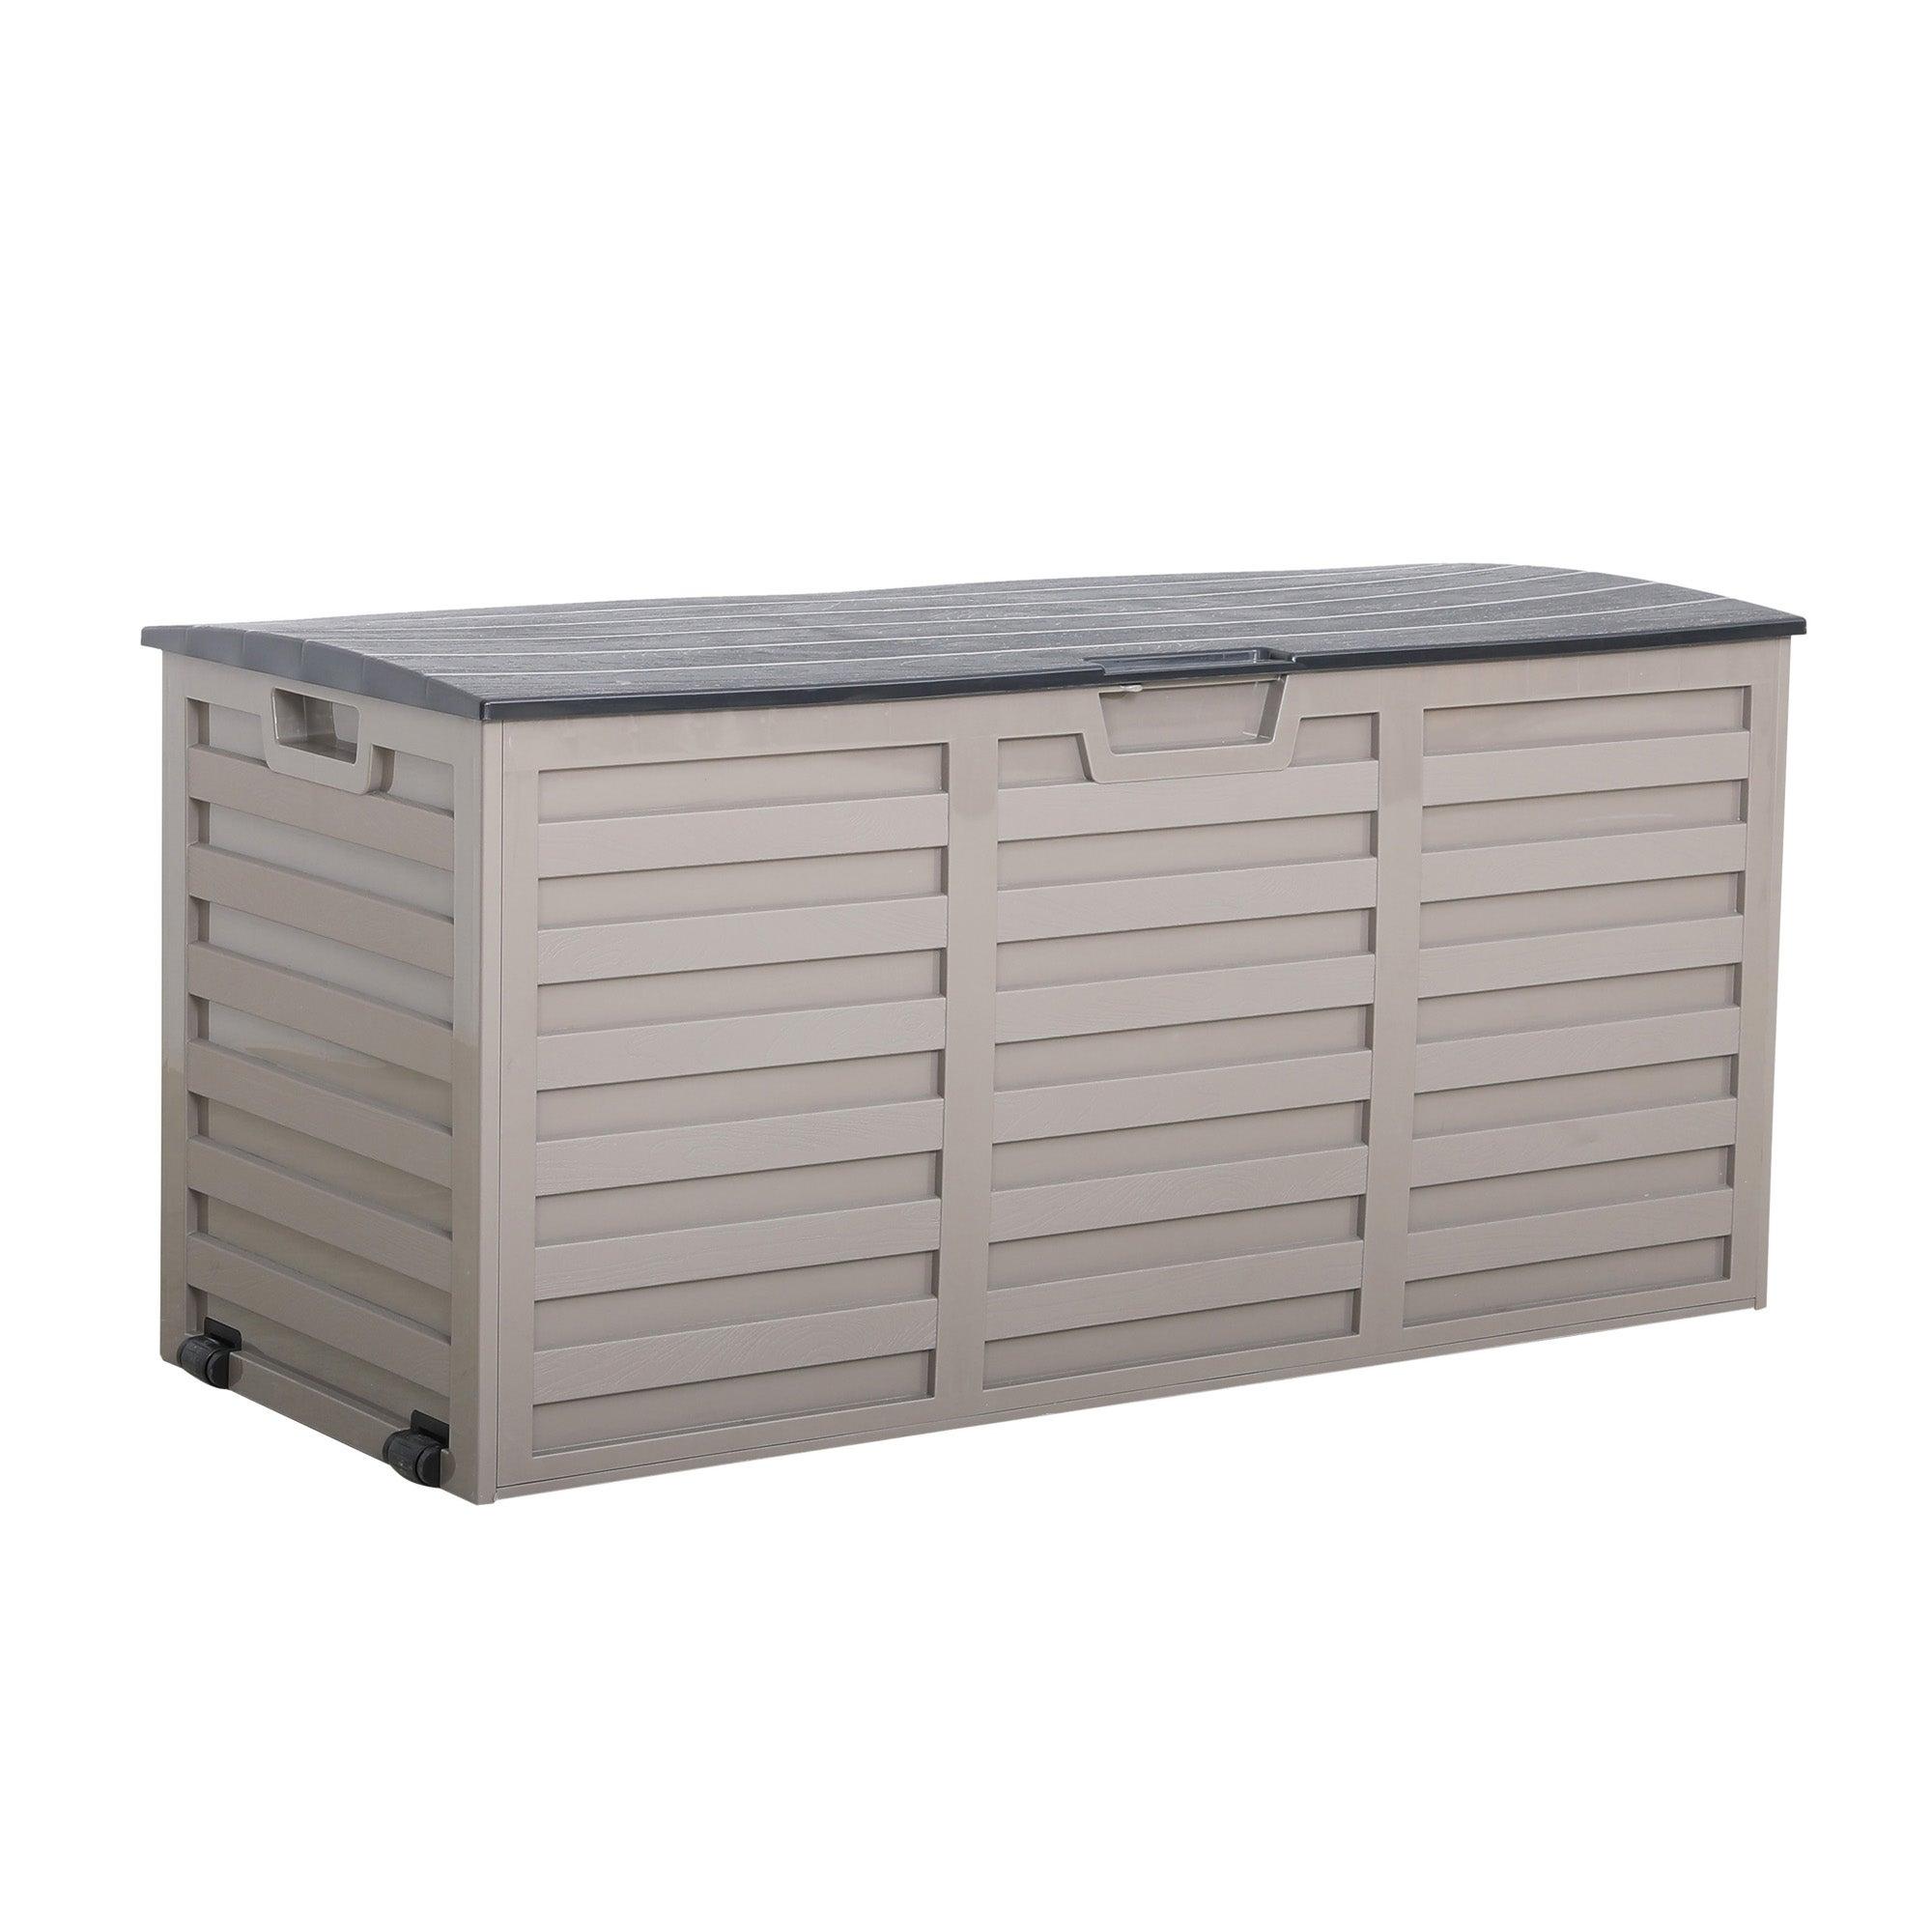 Grey and Black Waterproof Outdoor Storage Box with Wheels Dark Grey